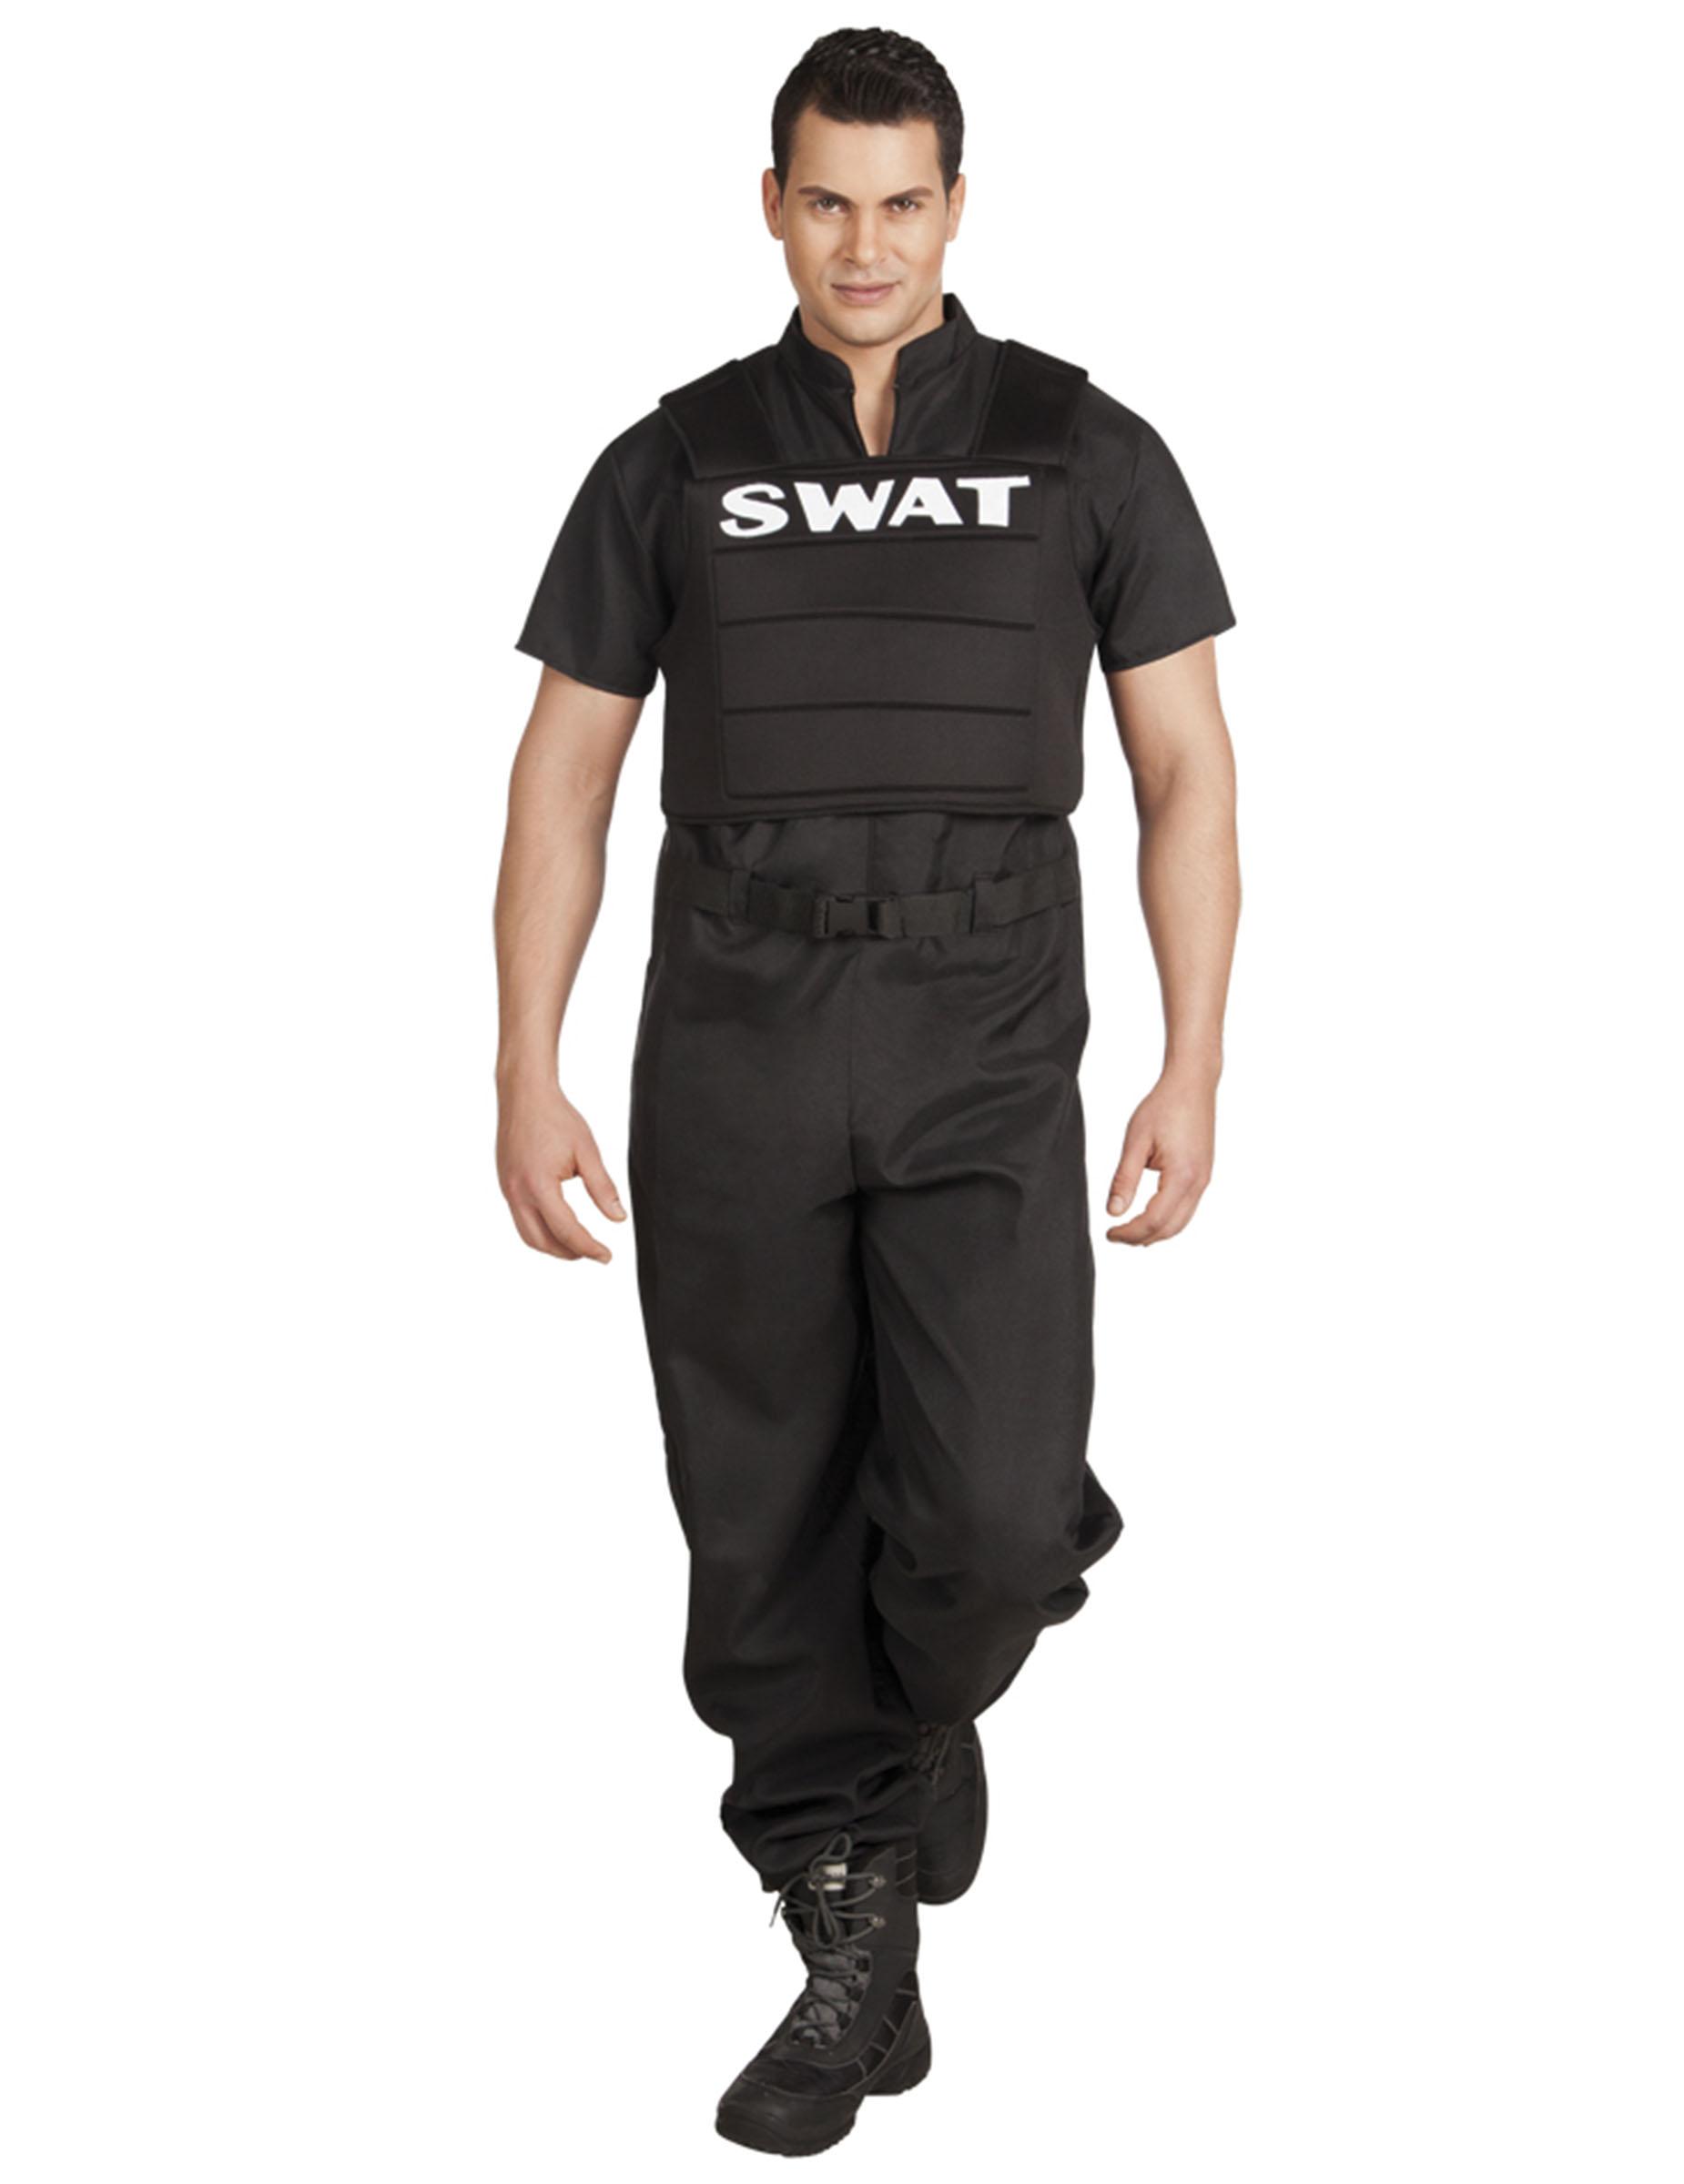 verkleidung swat f r m nner kost me f r erwachsene und g nstige faschingskost me vegaoo. Black Bedroom Furniture Sets. Home Design Ideas